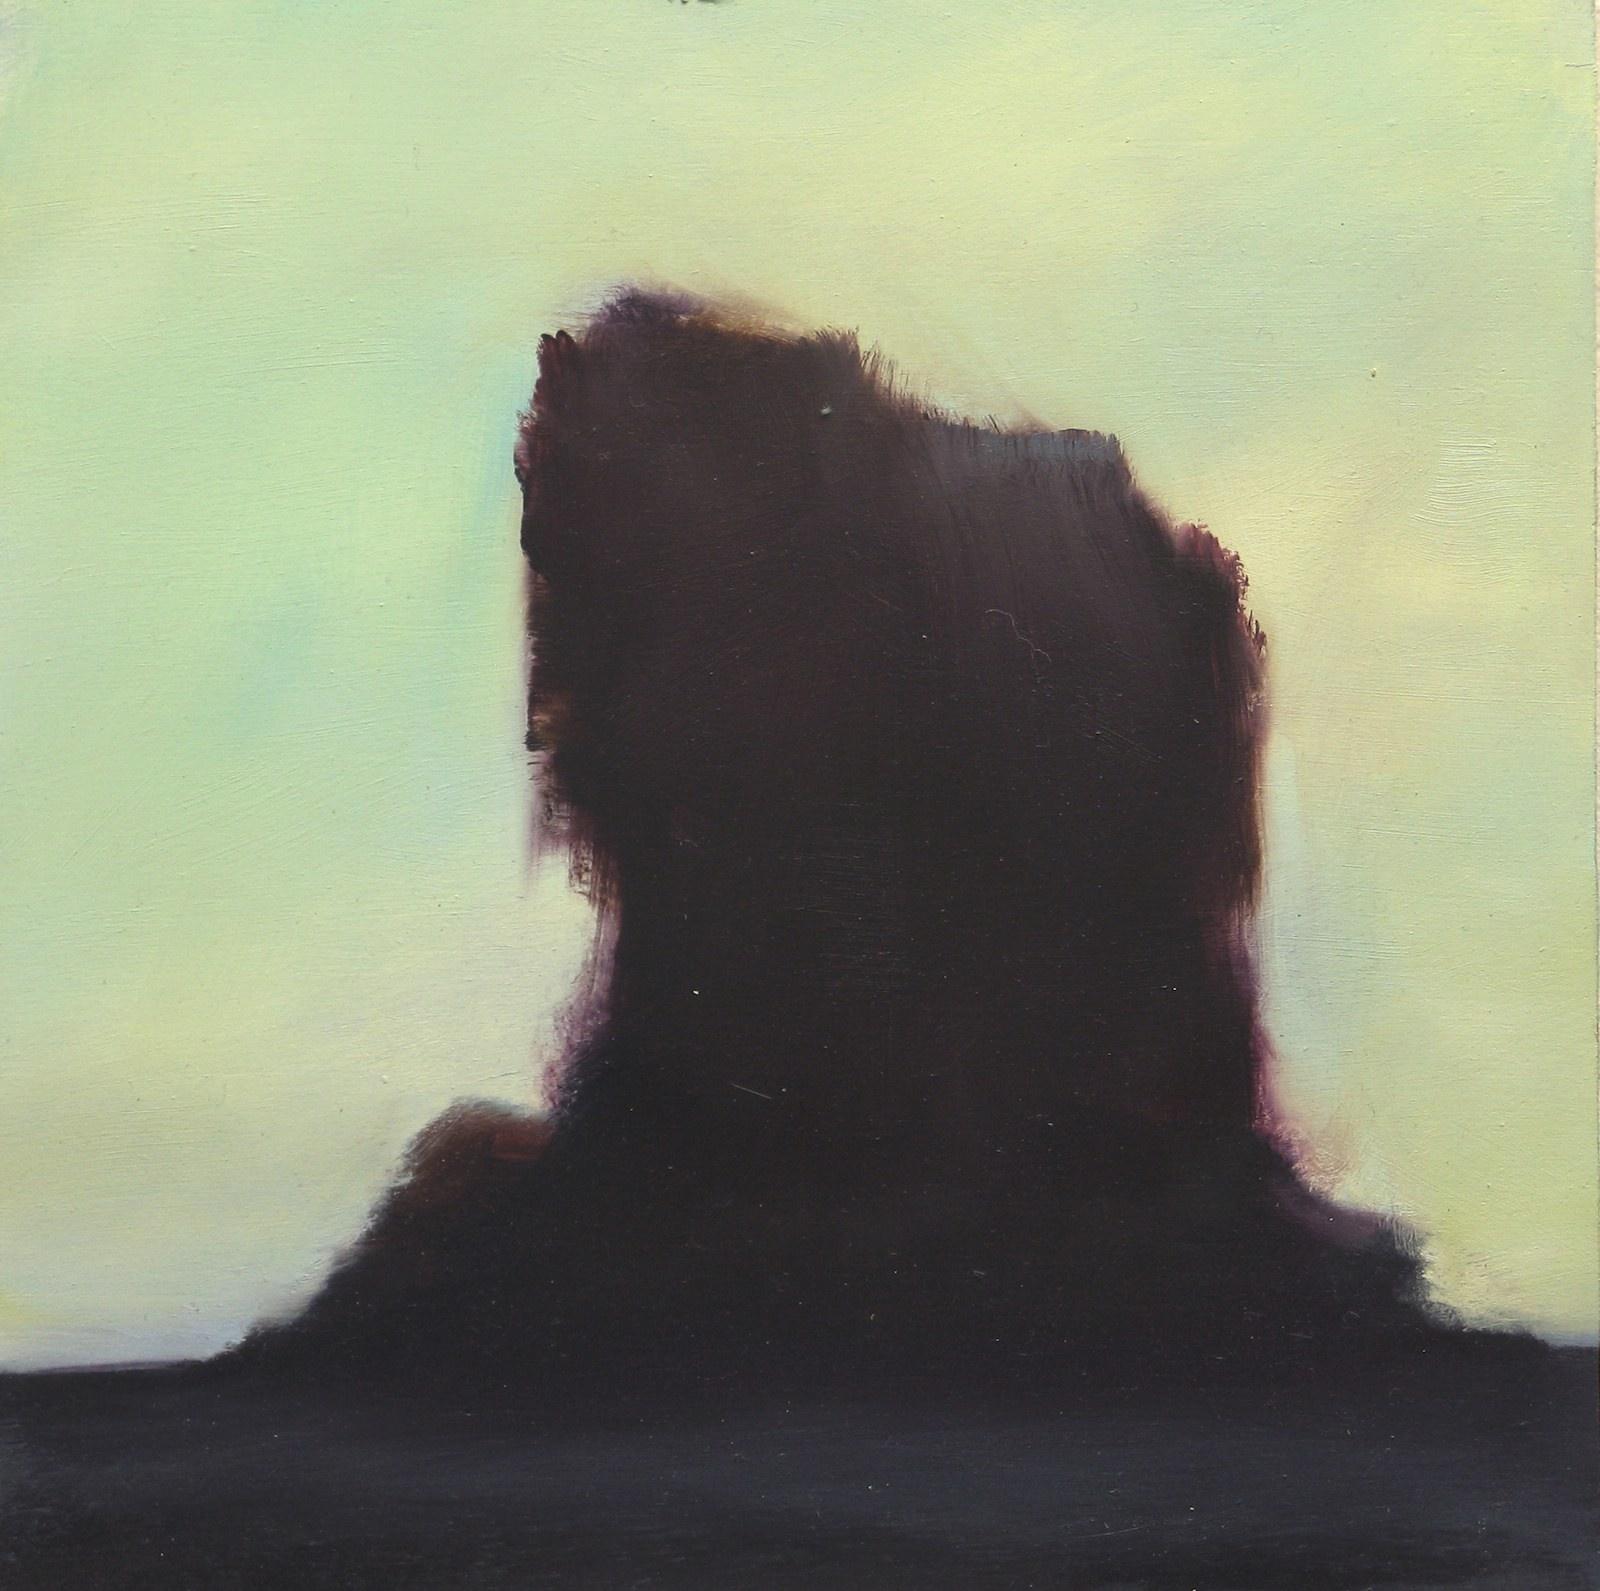 Arizona,25 x 25 cm, 2009